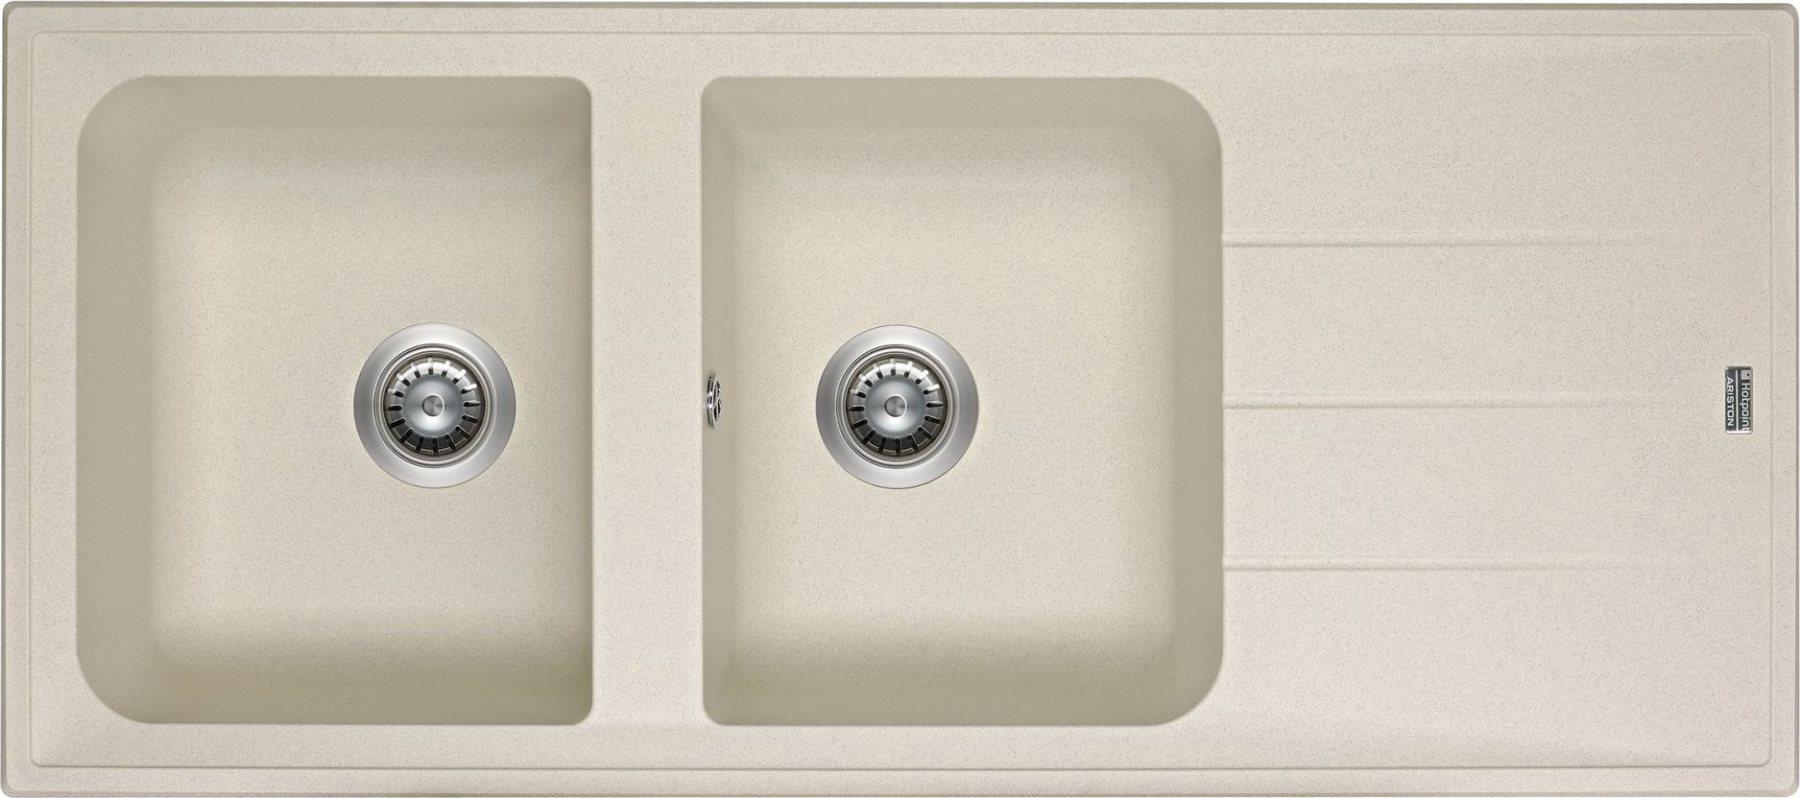 Hotpoint ariston lavello cucina incasso 2 vasche - Lavello cucina avena ...